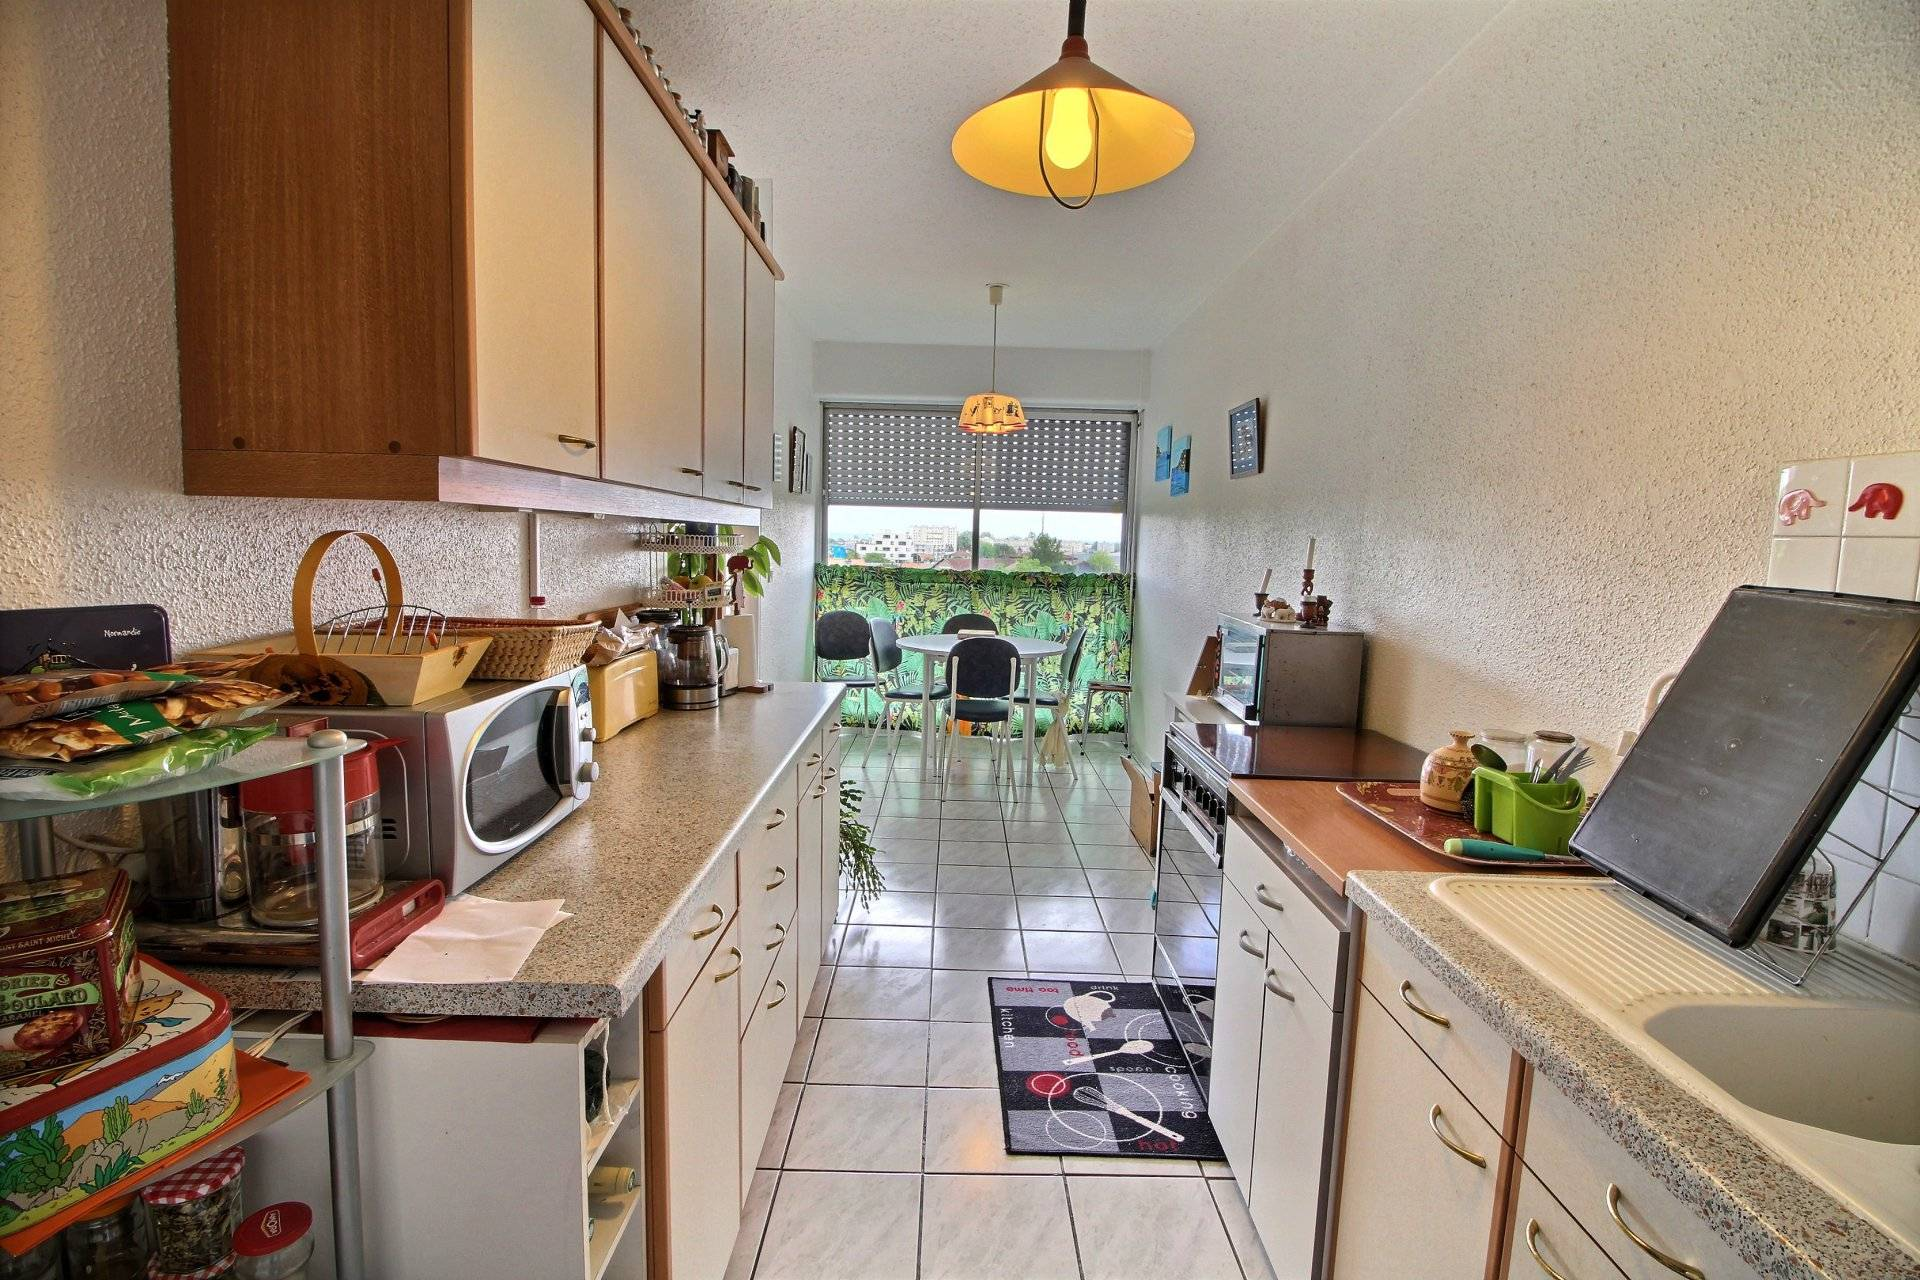 achat appartement proche bordeaux merignac limite cauderan coldwell banker. Black Bedroom Furniture Sets. Home Design Ideas